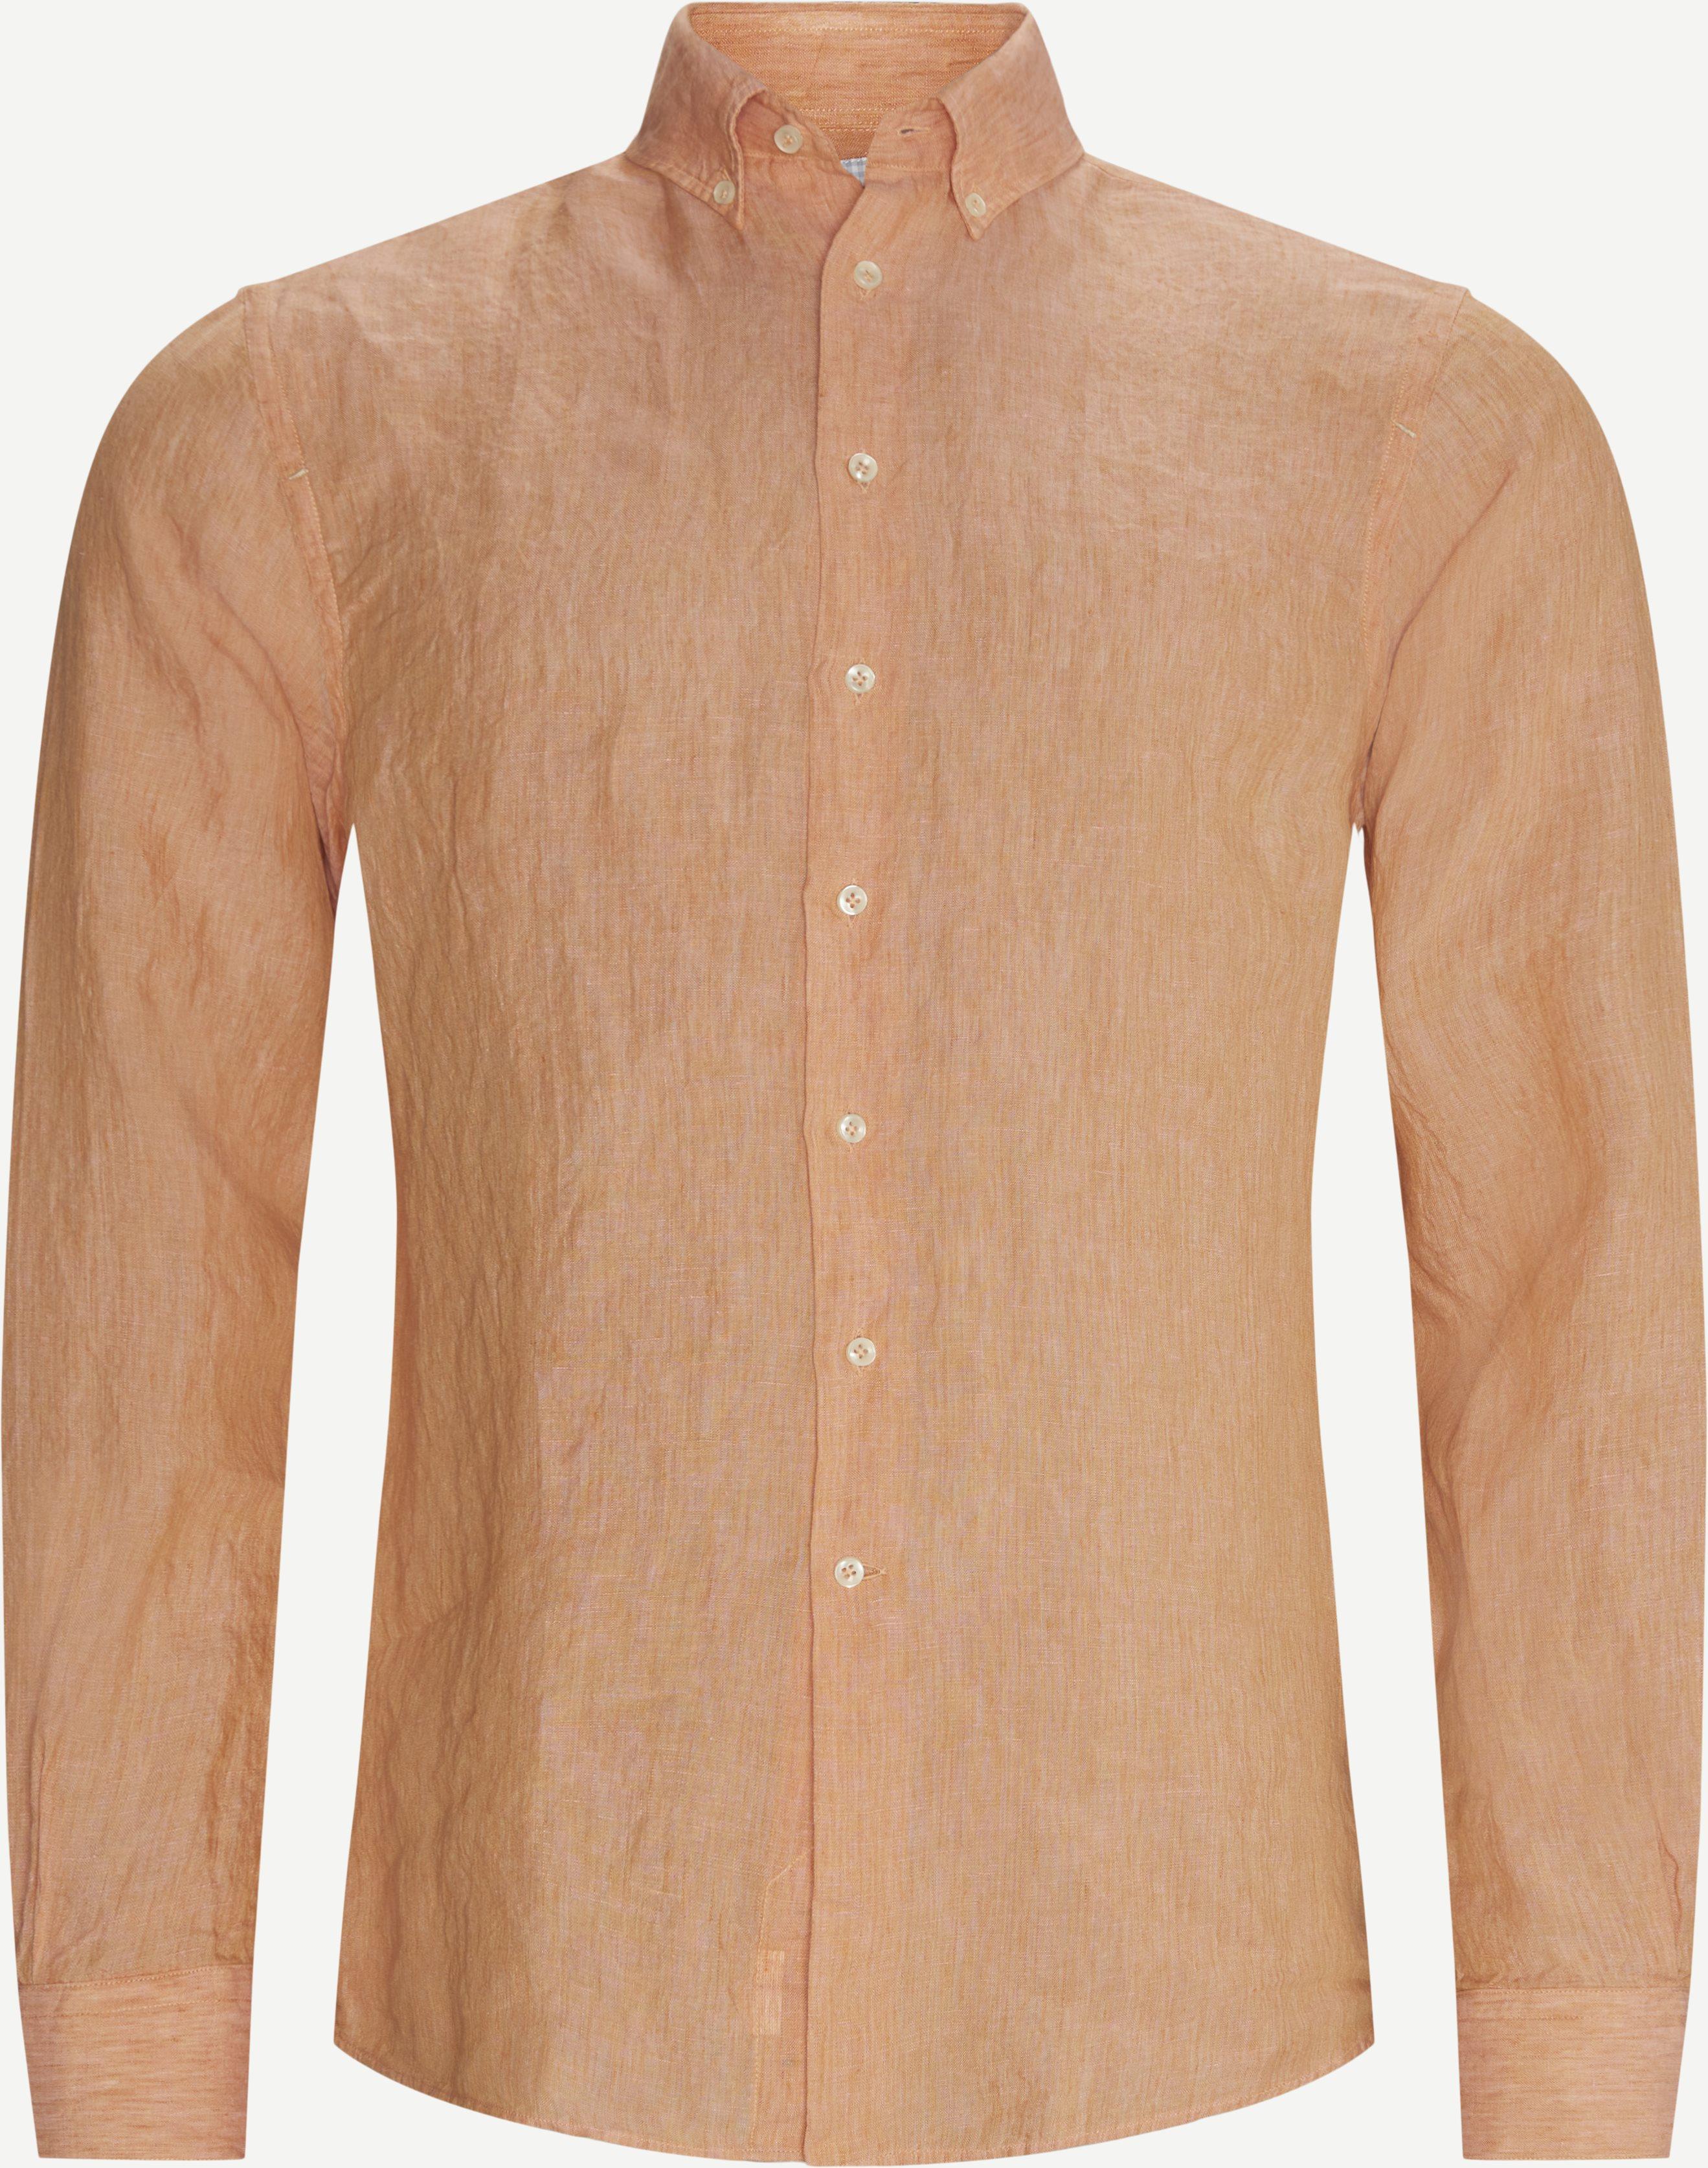 Summer Linen Skjorte - Shirts - Regular fit - Red